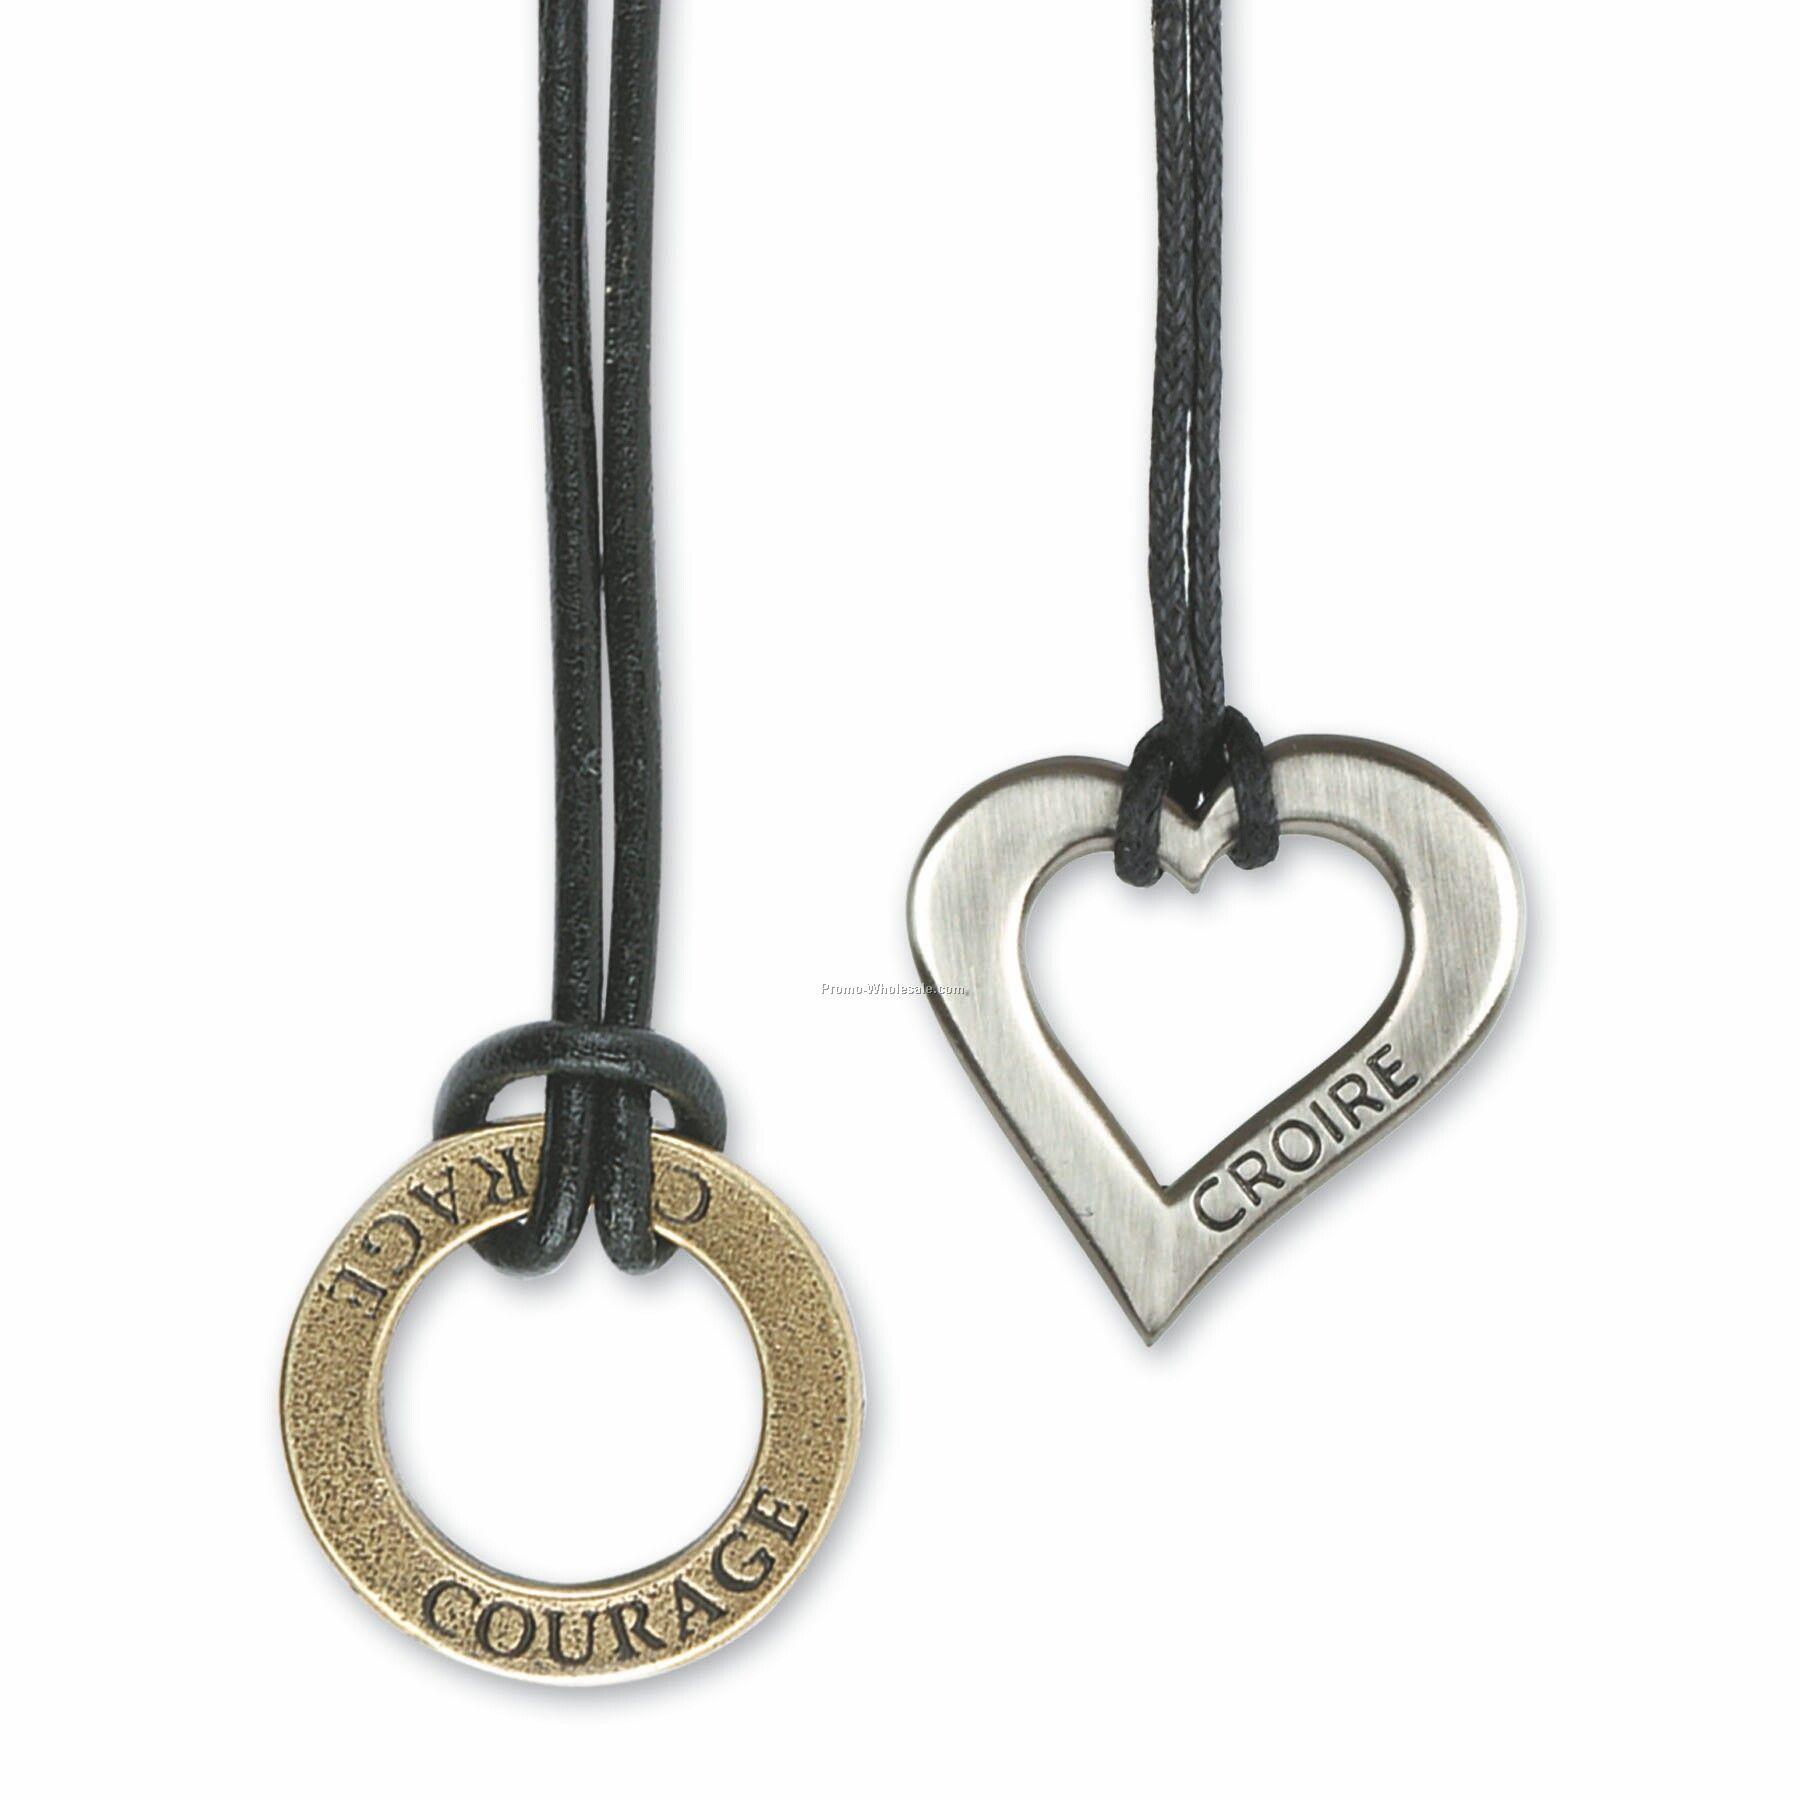 Pendantschina wholesale pendants cnij inspirational necklaces aloadofball Gallery